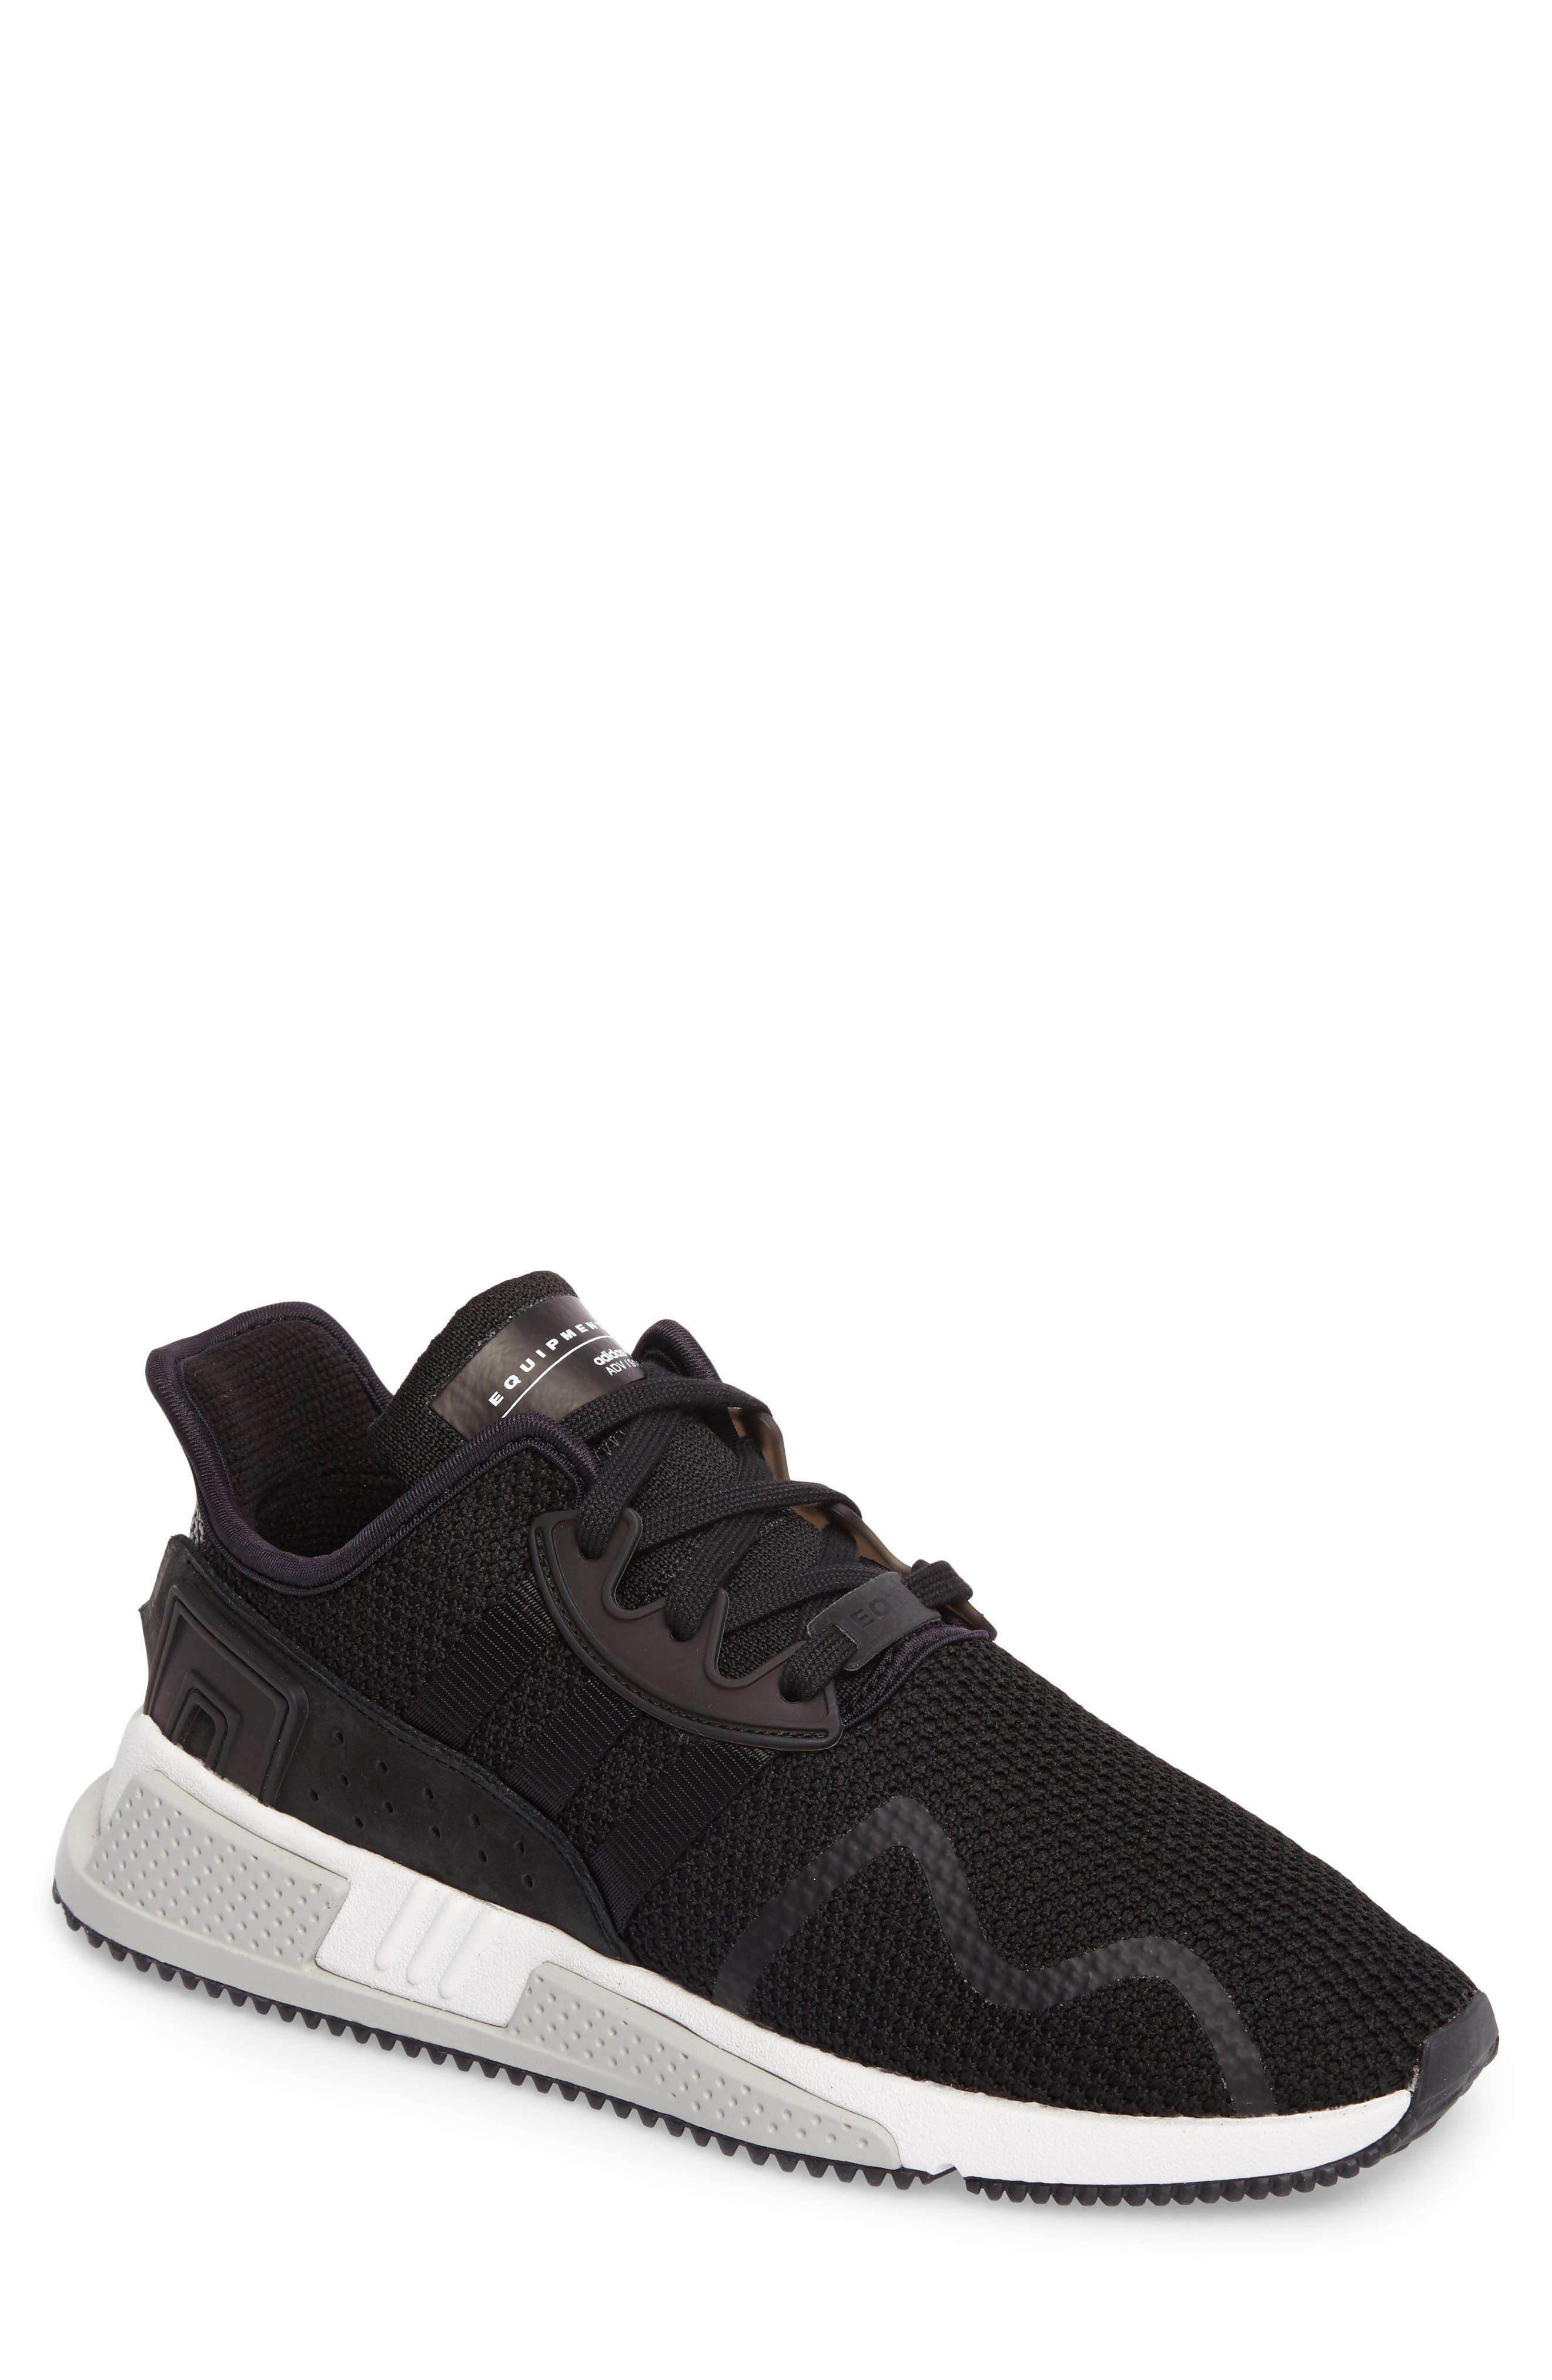 EQT Cushion ADV Sneaker,                             Main thumbnail 1, color,                             001